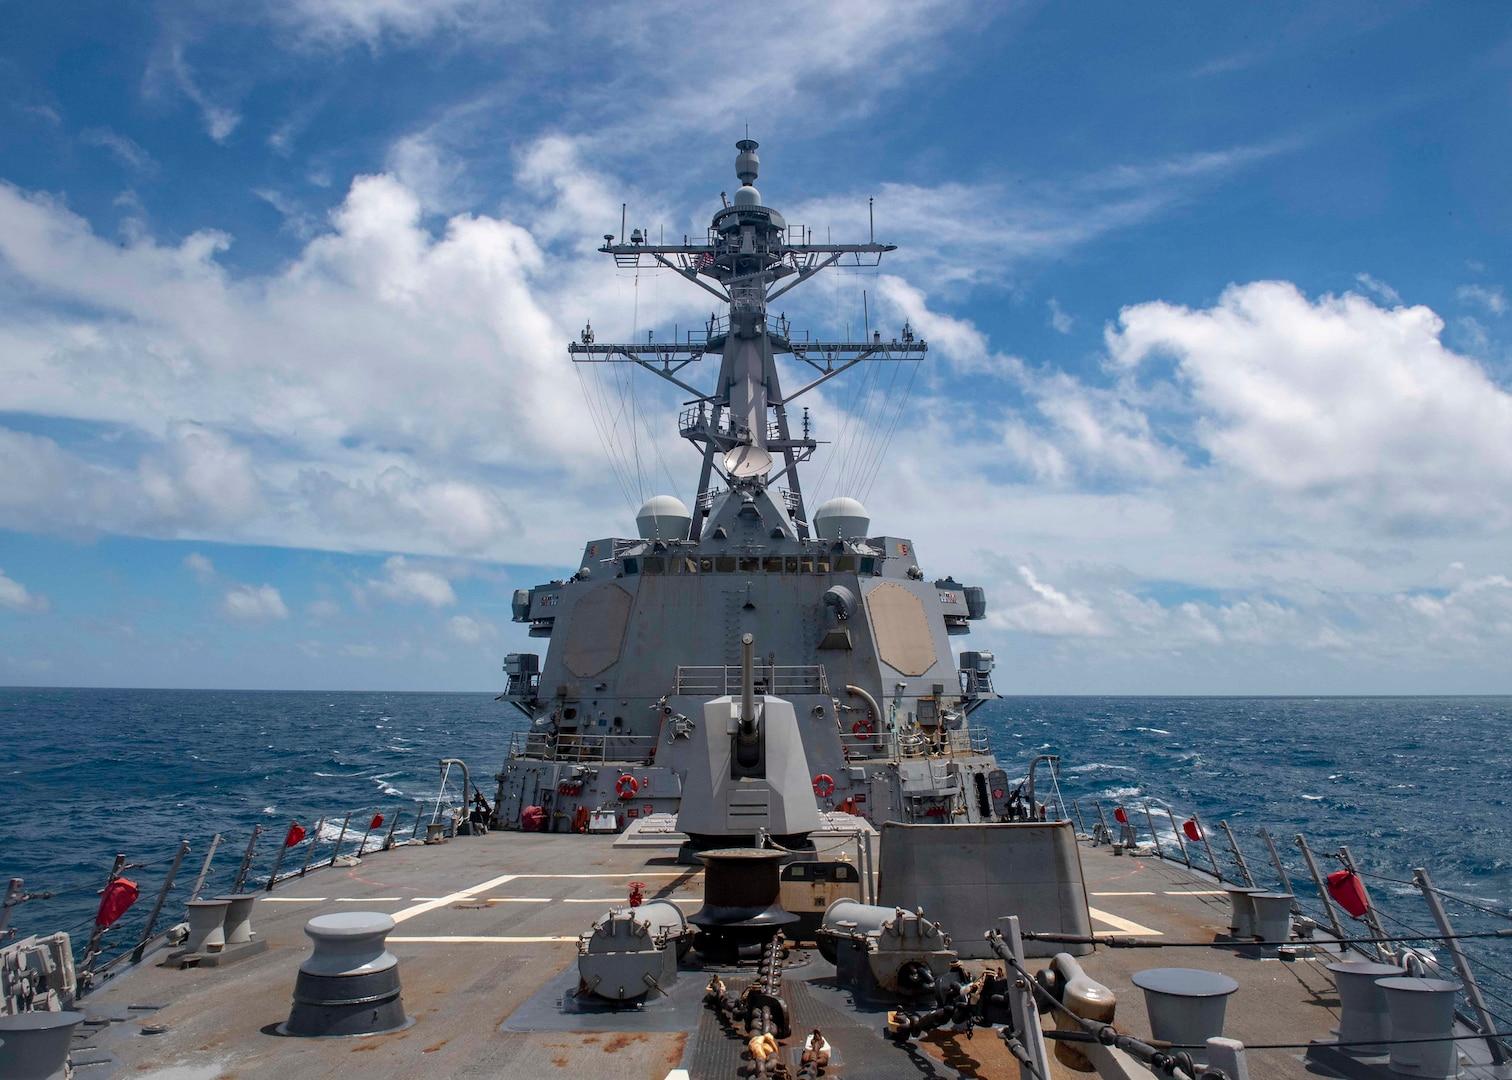 USS Mustin transits the Taiwan Strait